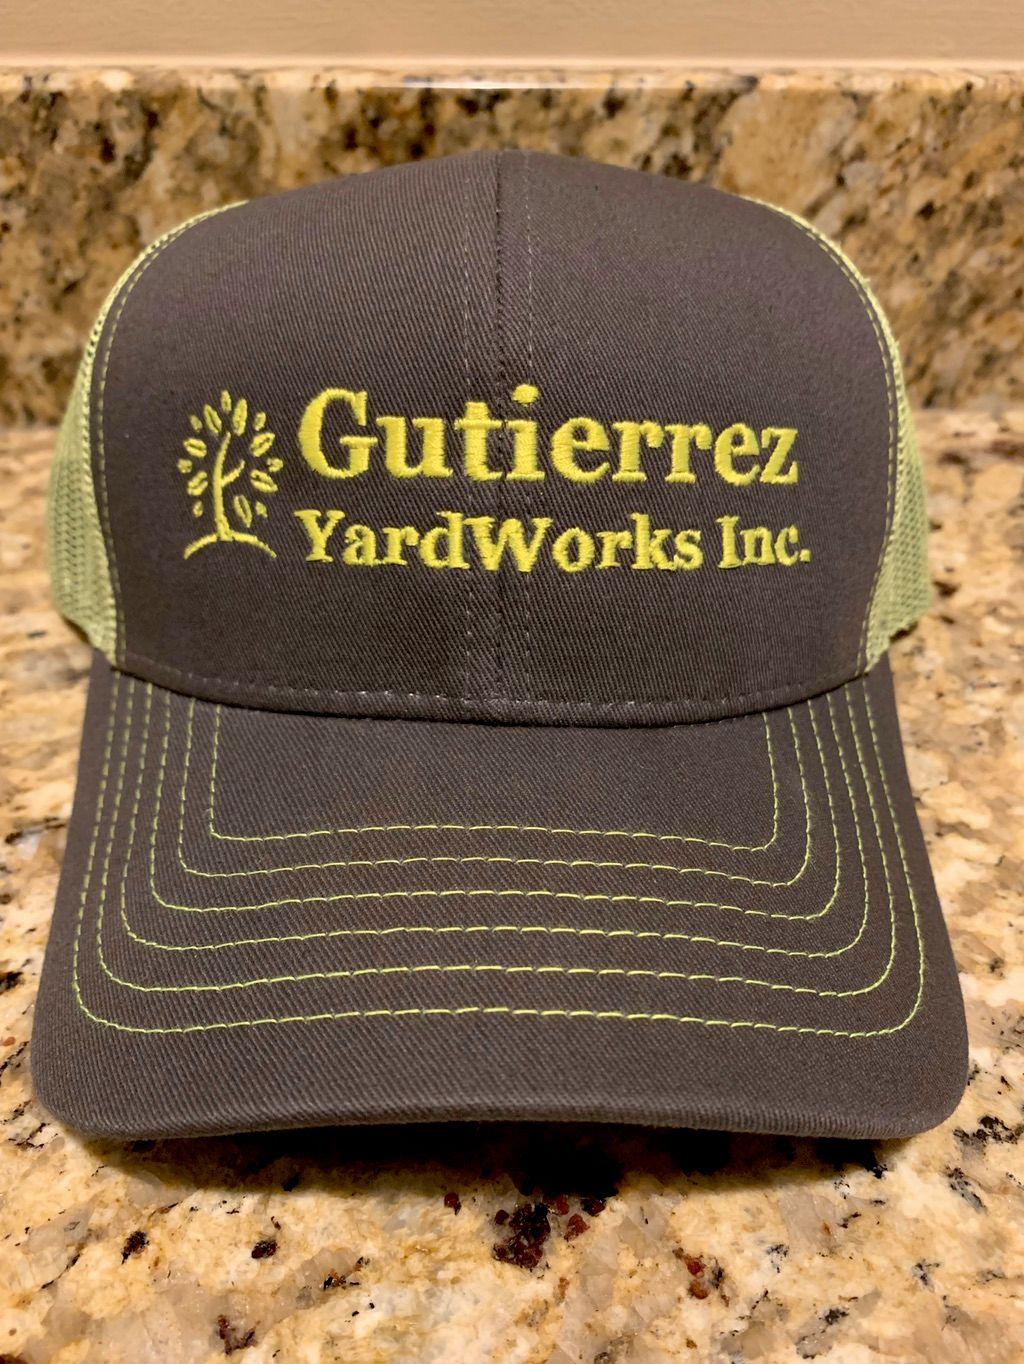 Gutierrez YardWorks Inc.